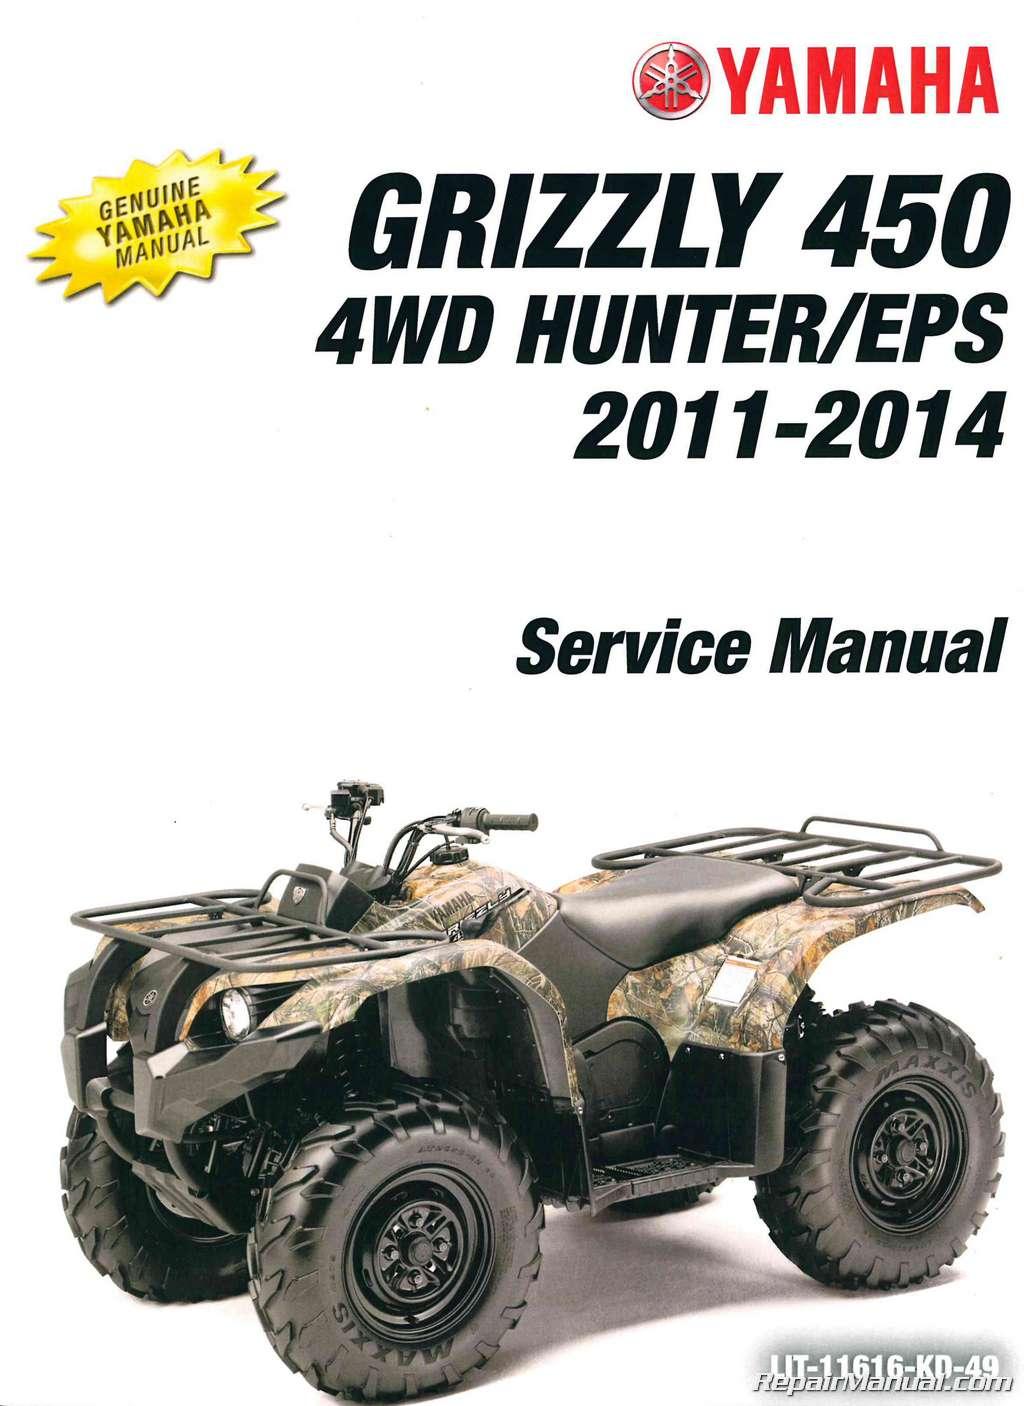 free yamaha atv service manuals online carnmotors com rh carnmotors com 2006 yamaha grizzly 125 repair manual free yamaha grizzly 125 repair manual